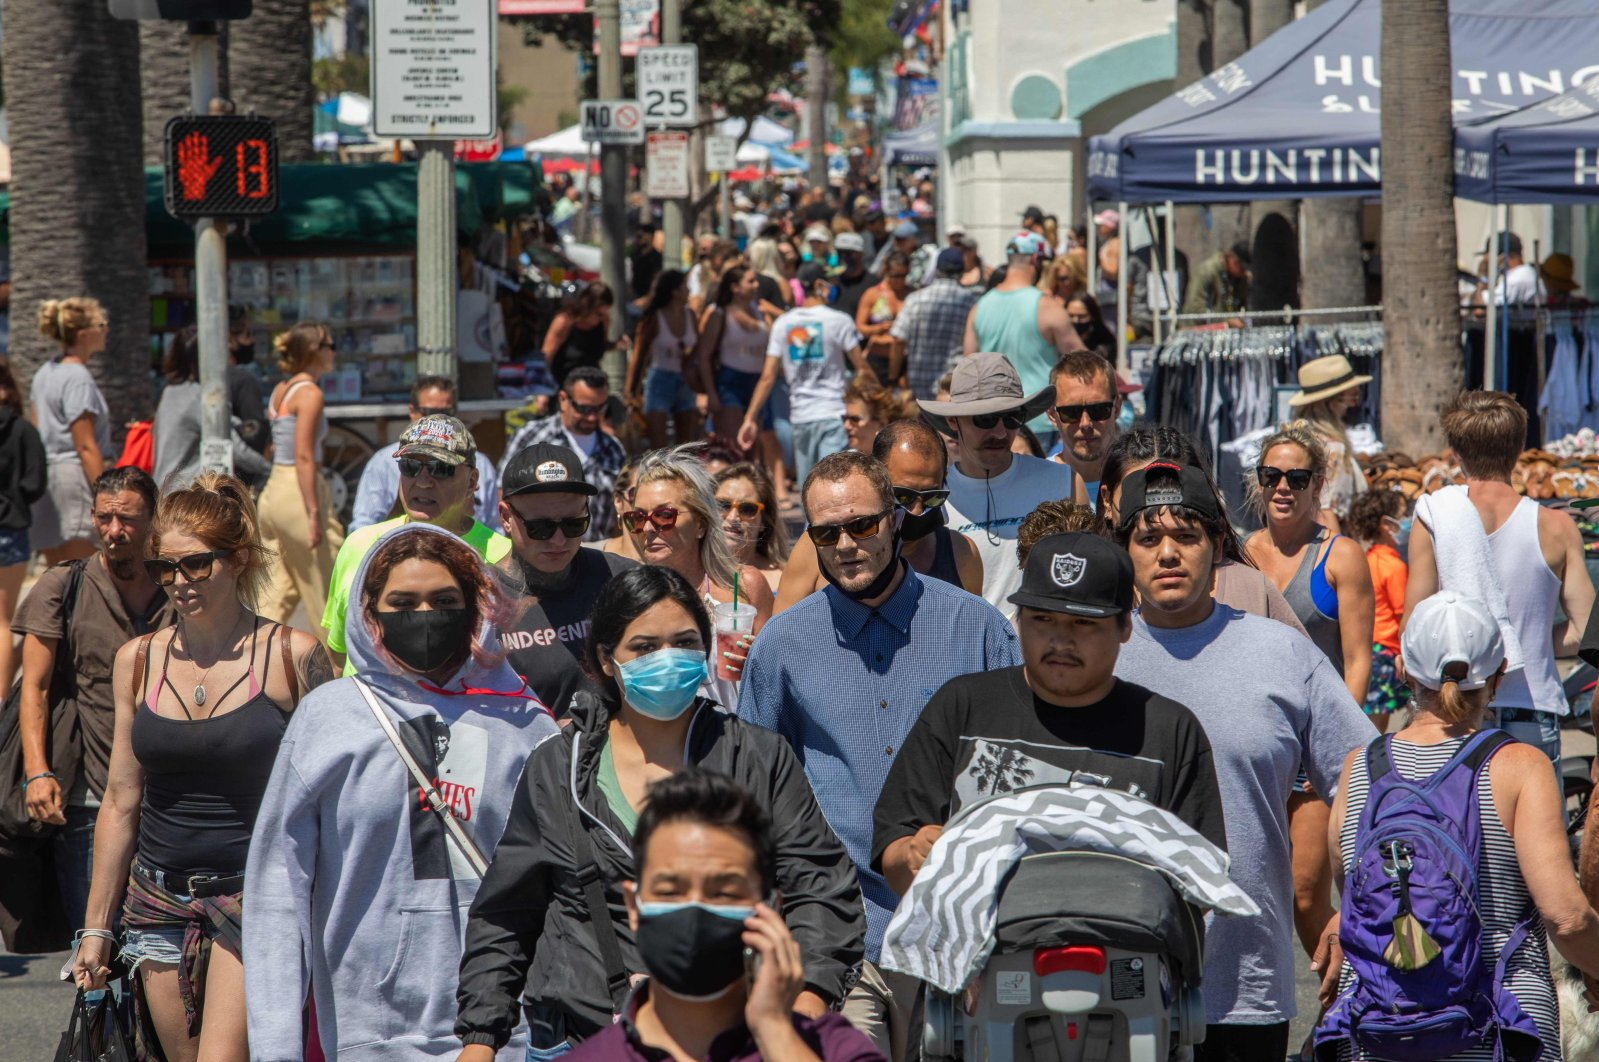 People cross the street in Huntington Beach, California, amid the coronavirus pandemic, July 19, 2020. (AFP Photo)